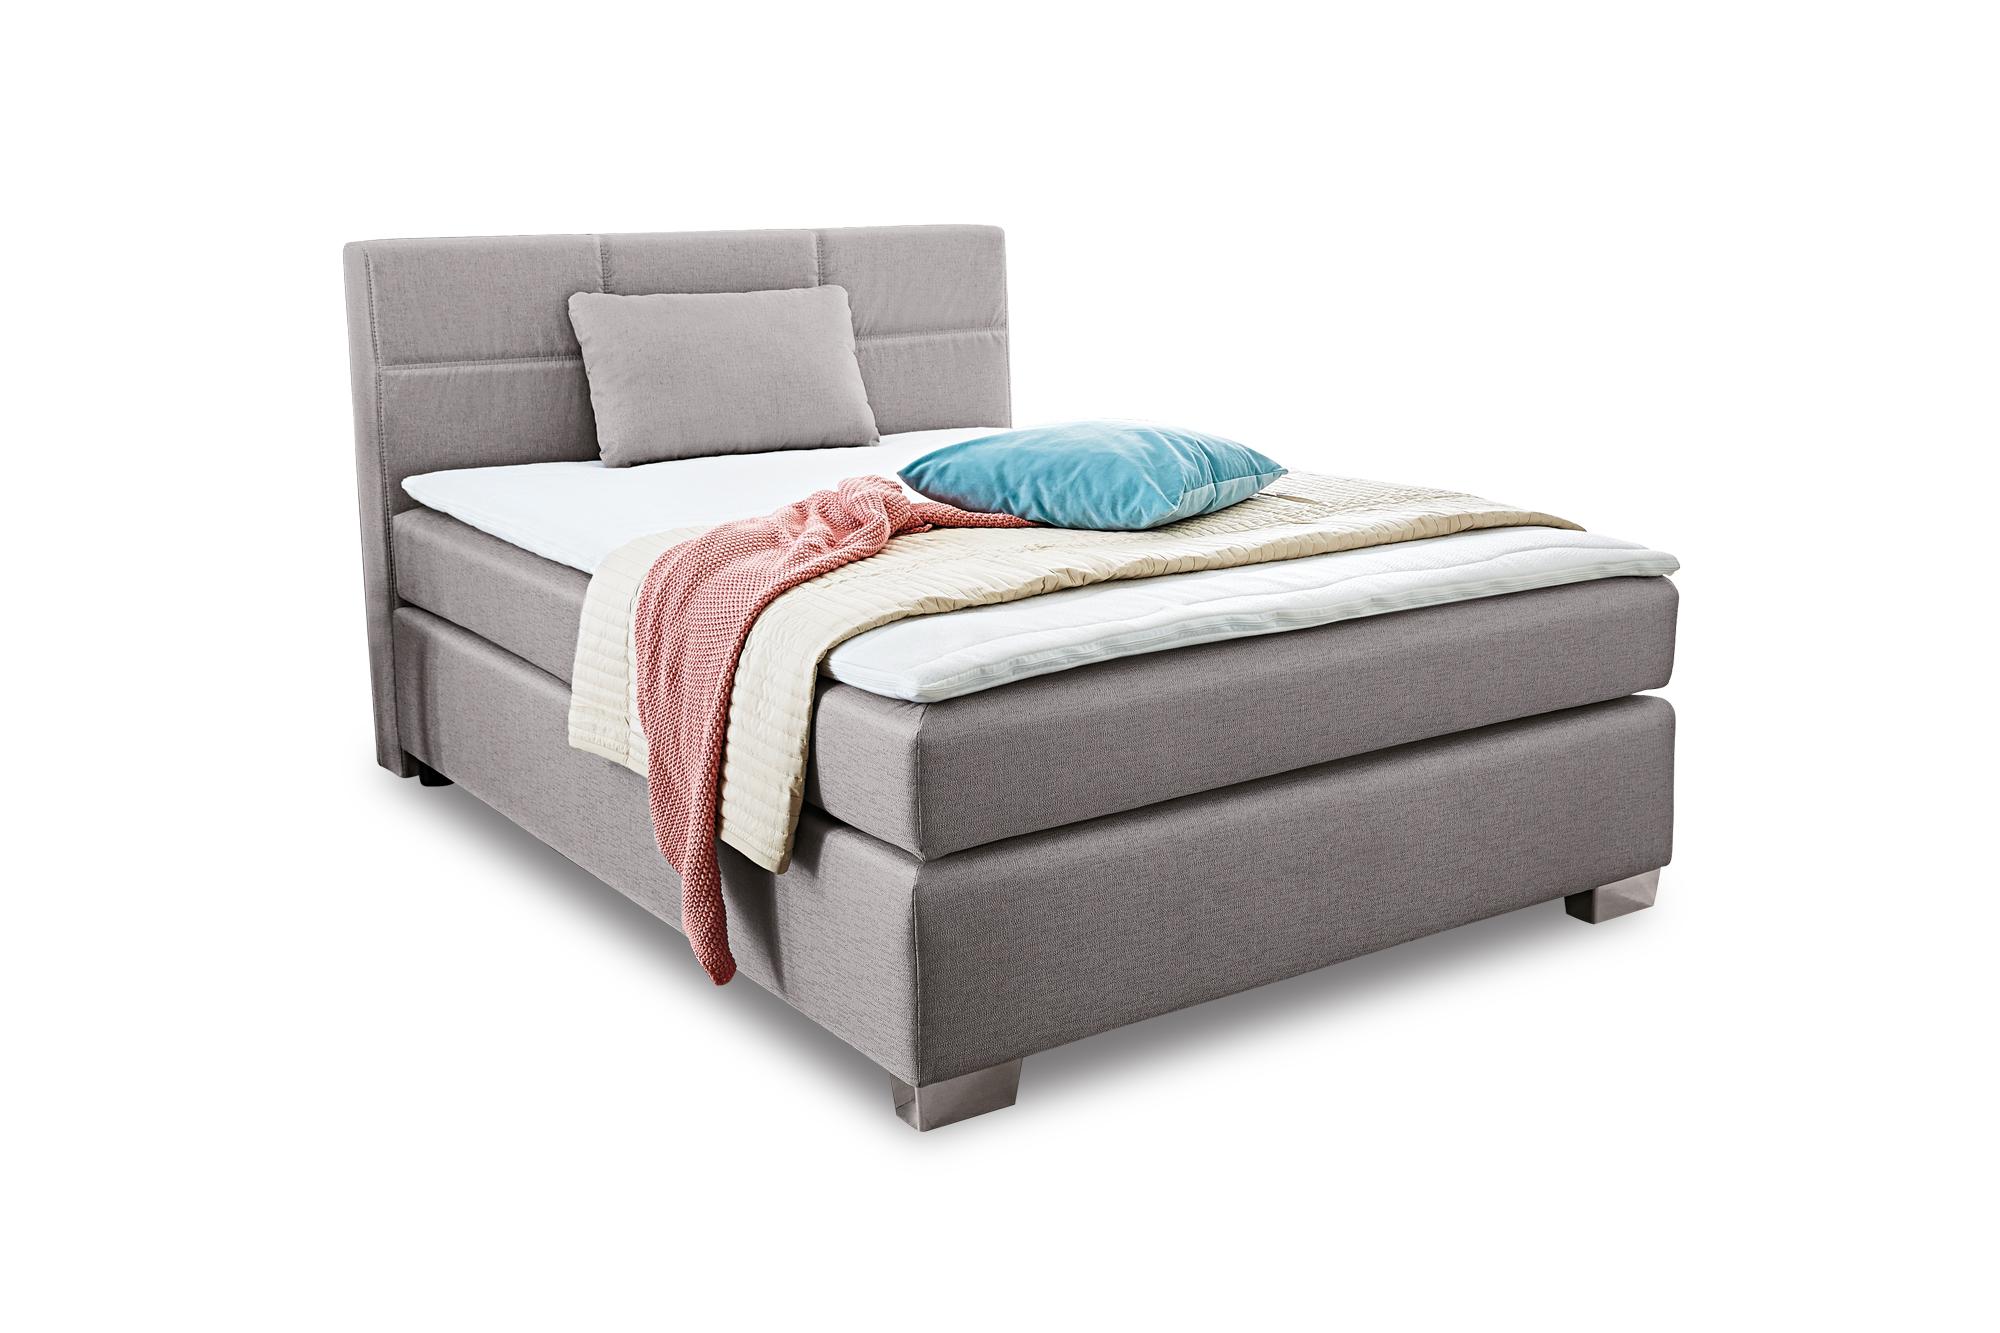 jockenh fer boxspringbett evita ruthie 140 x 200 cm m bel letz ihr online shop. Black Bedroom Furniture Sets. Home Design Ideas